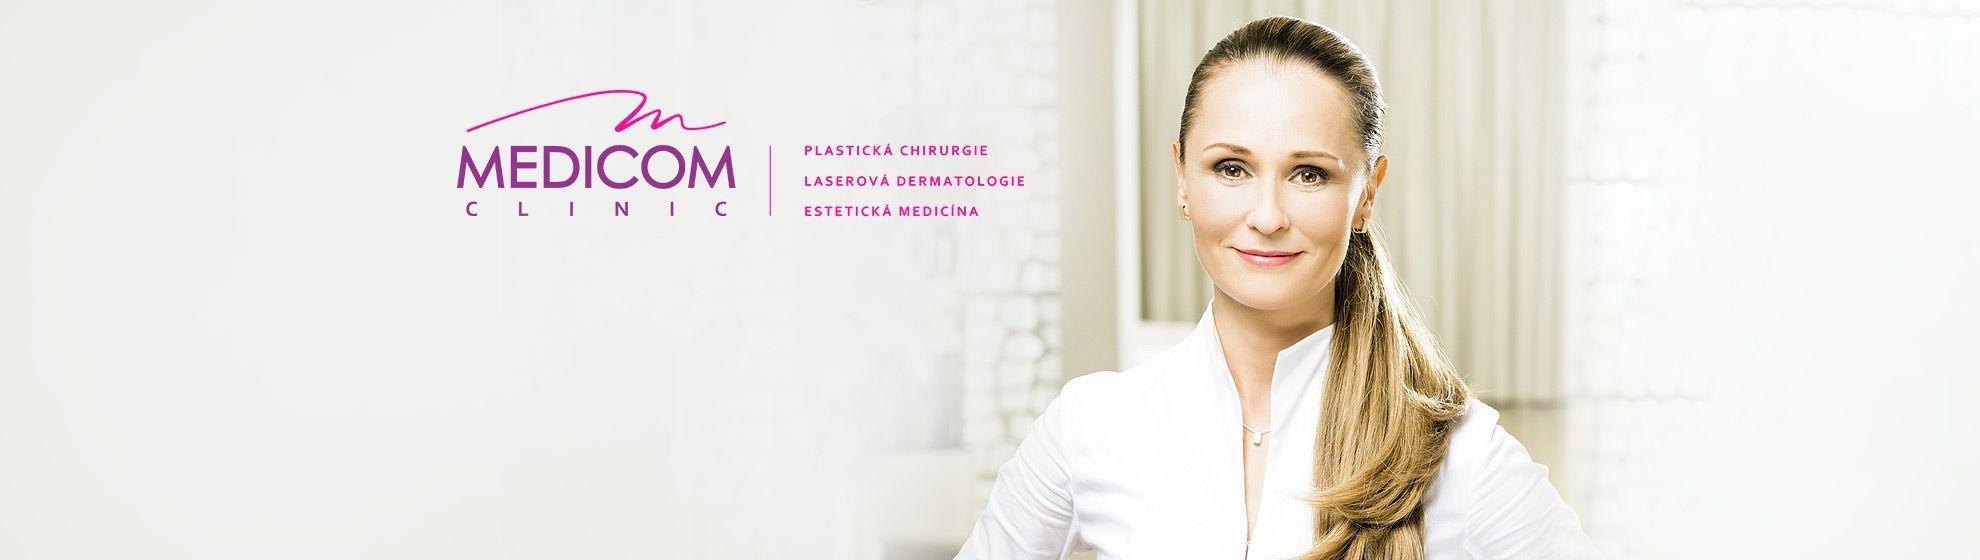 MUDr. Katarína Třísková - MEDICOM Clinic